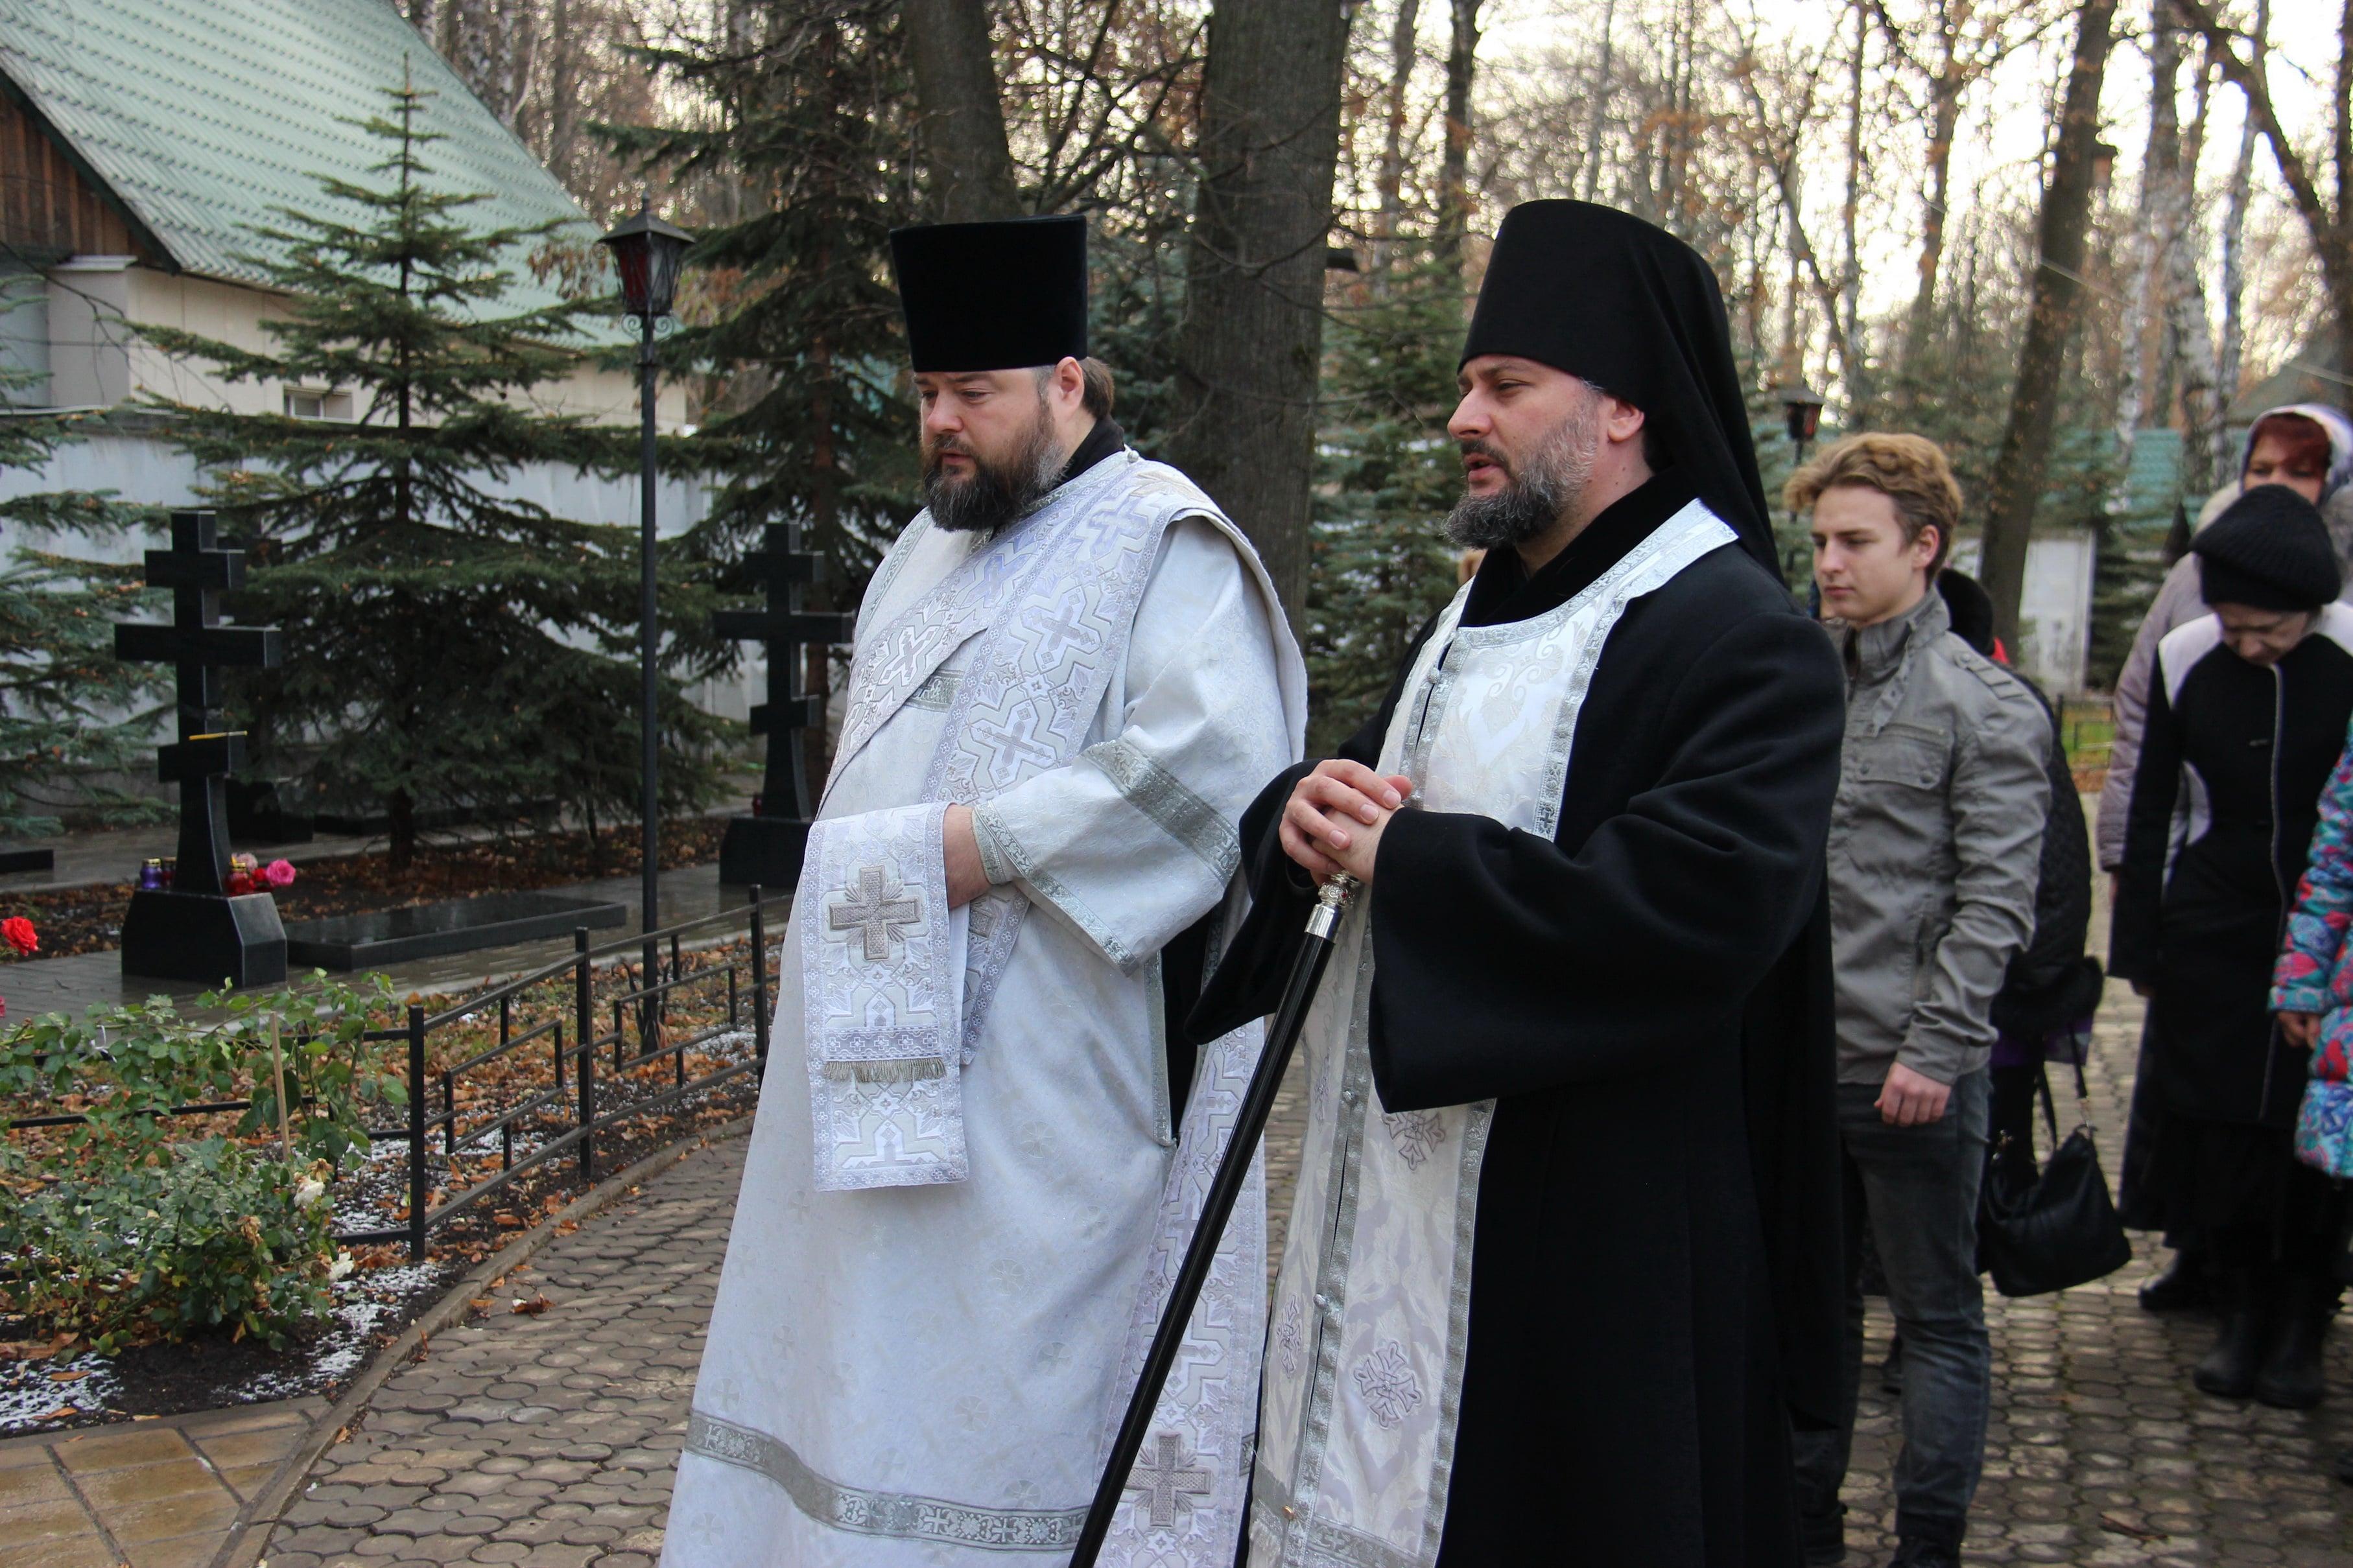 http://monuspen.ru/photoreports/49c70fe0b2ab4cd788434817b137cf86.JPG